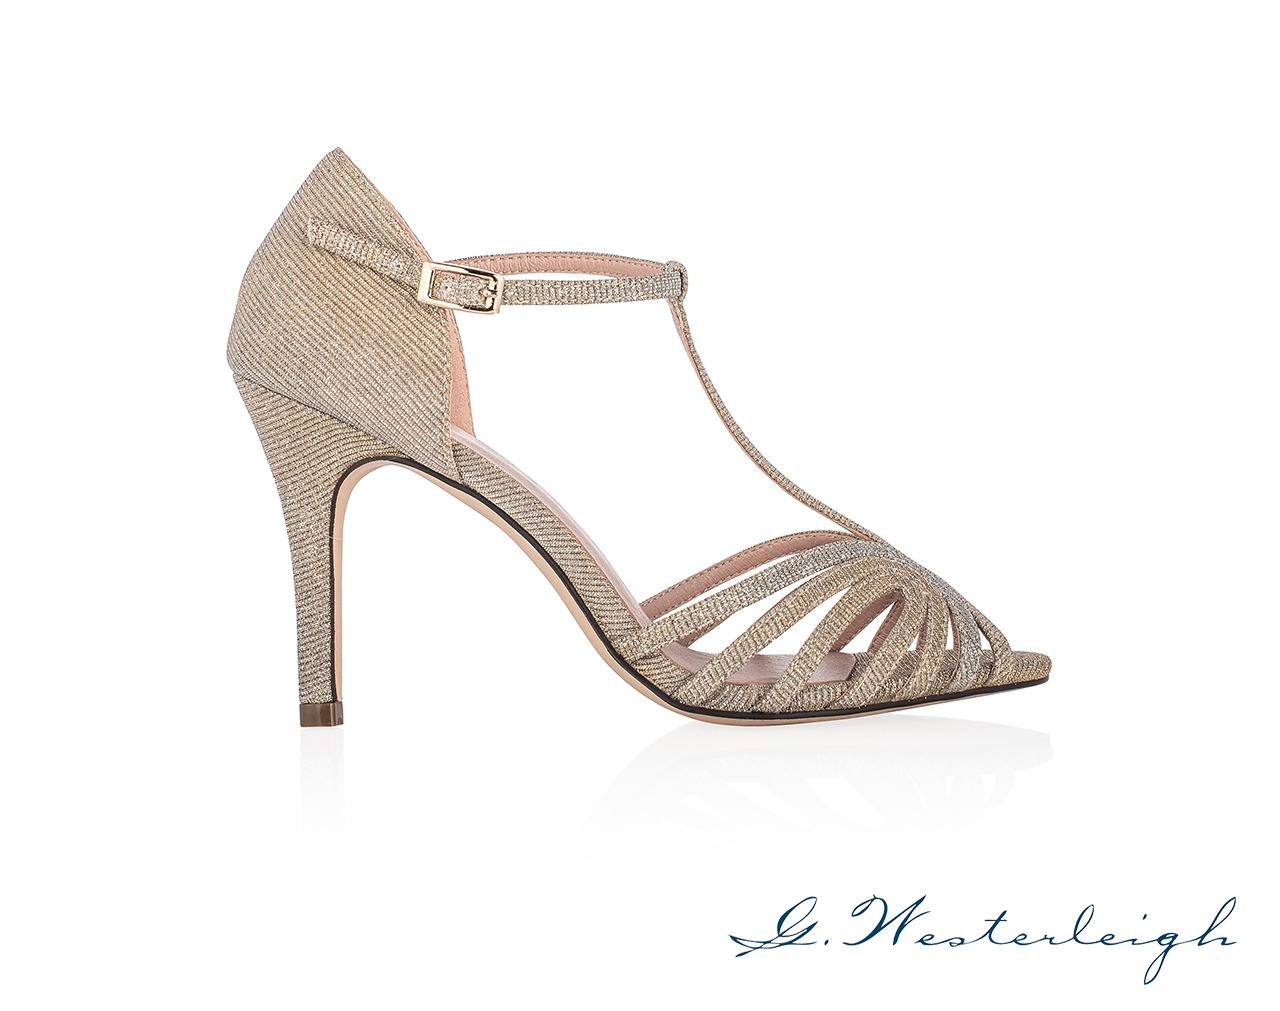 Spoločenské topánky Marbella - Obrázok č. 2